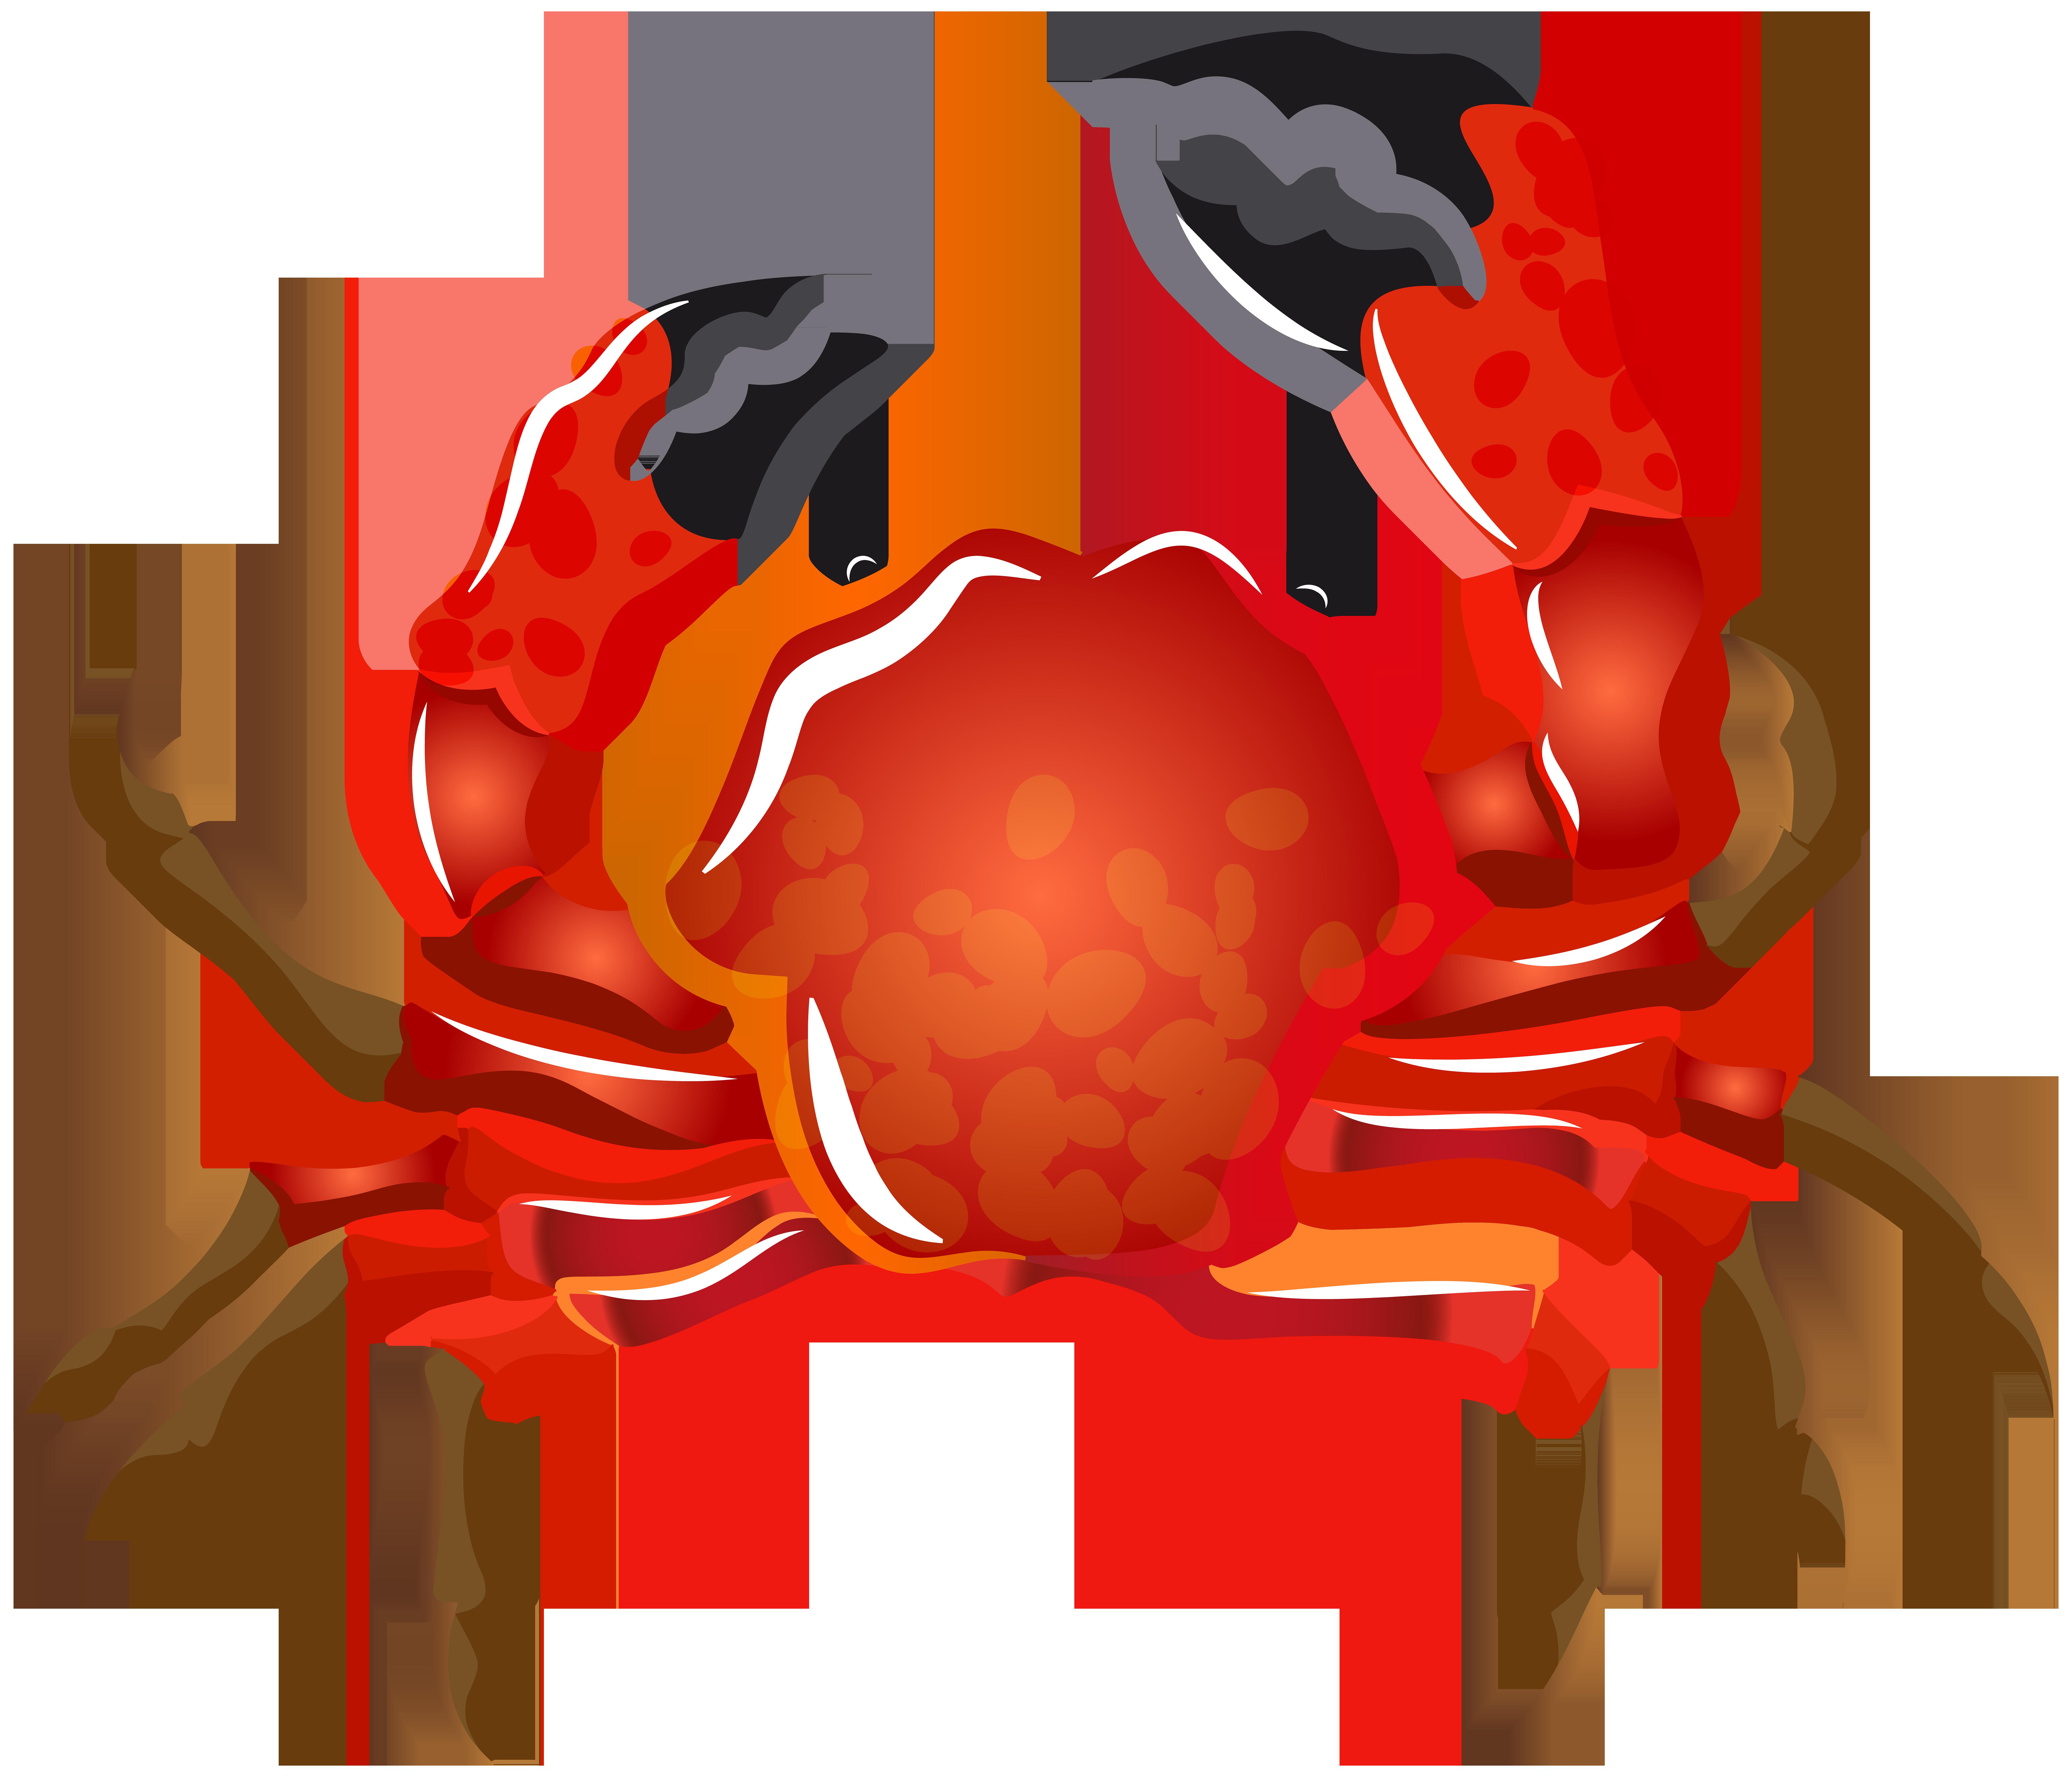 svg download Png image gallery yopriceville. Crab transparent